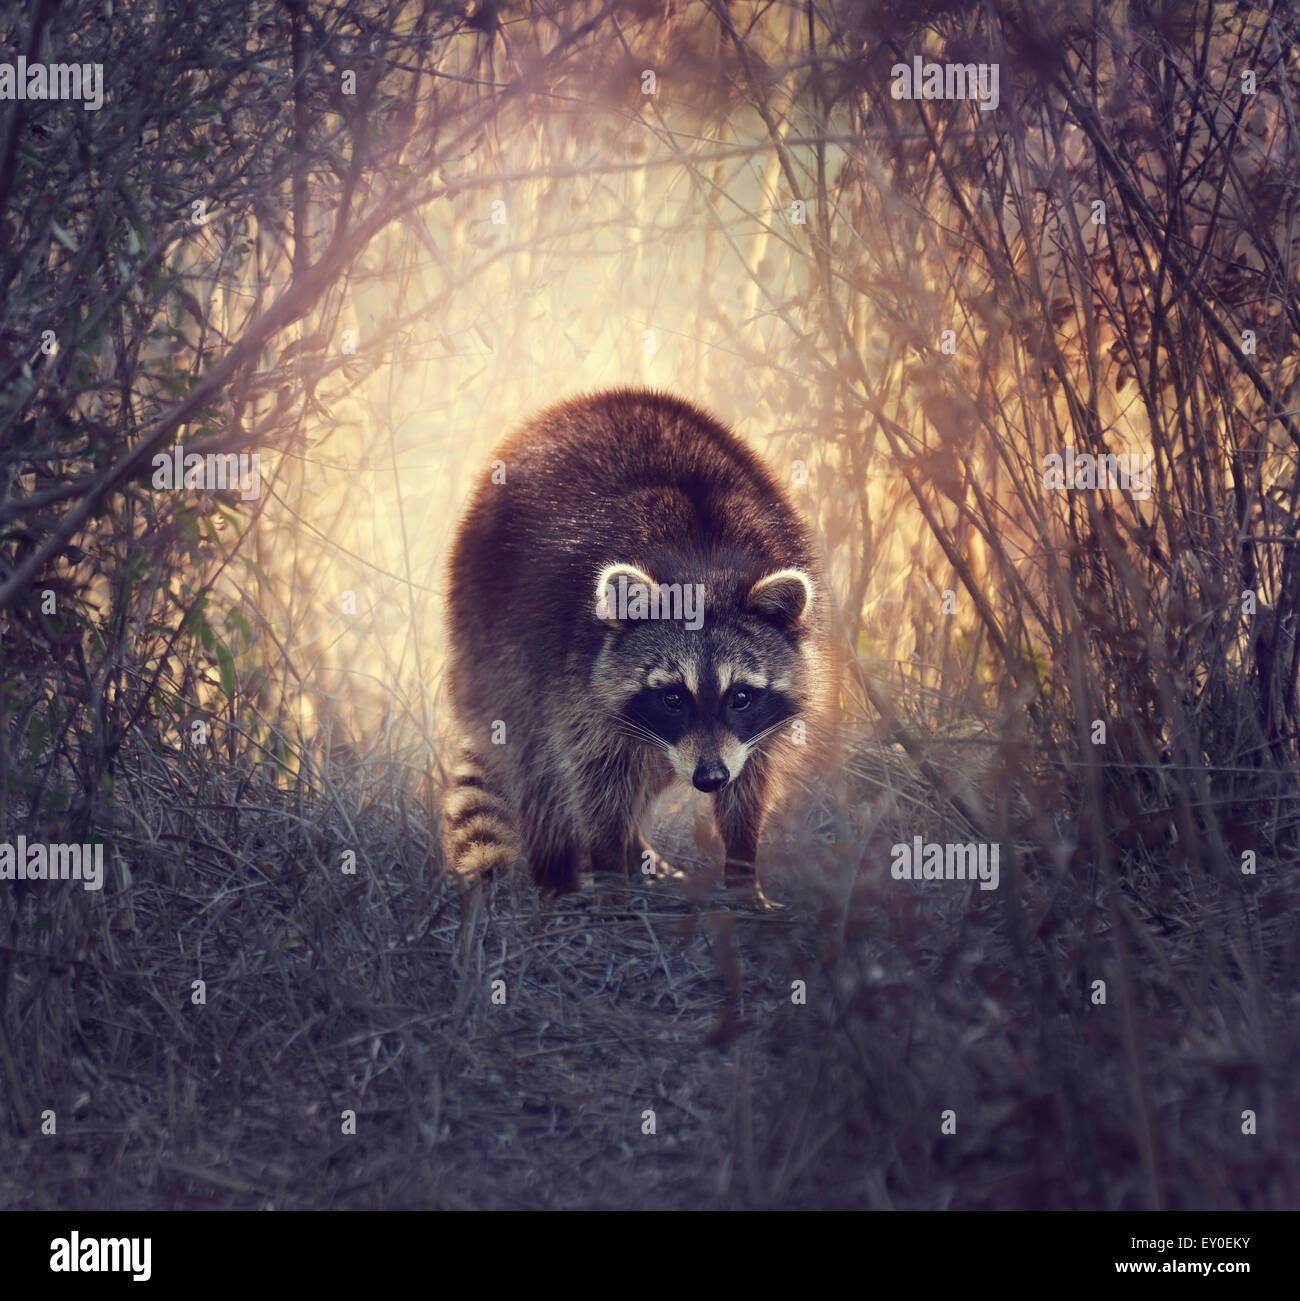 Wild Raccoon In Florida Wetlands At Sunset - Stock Image